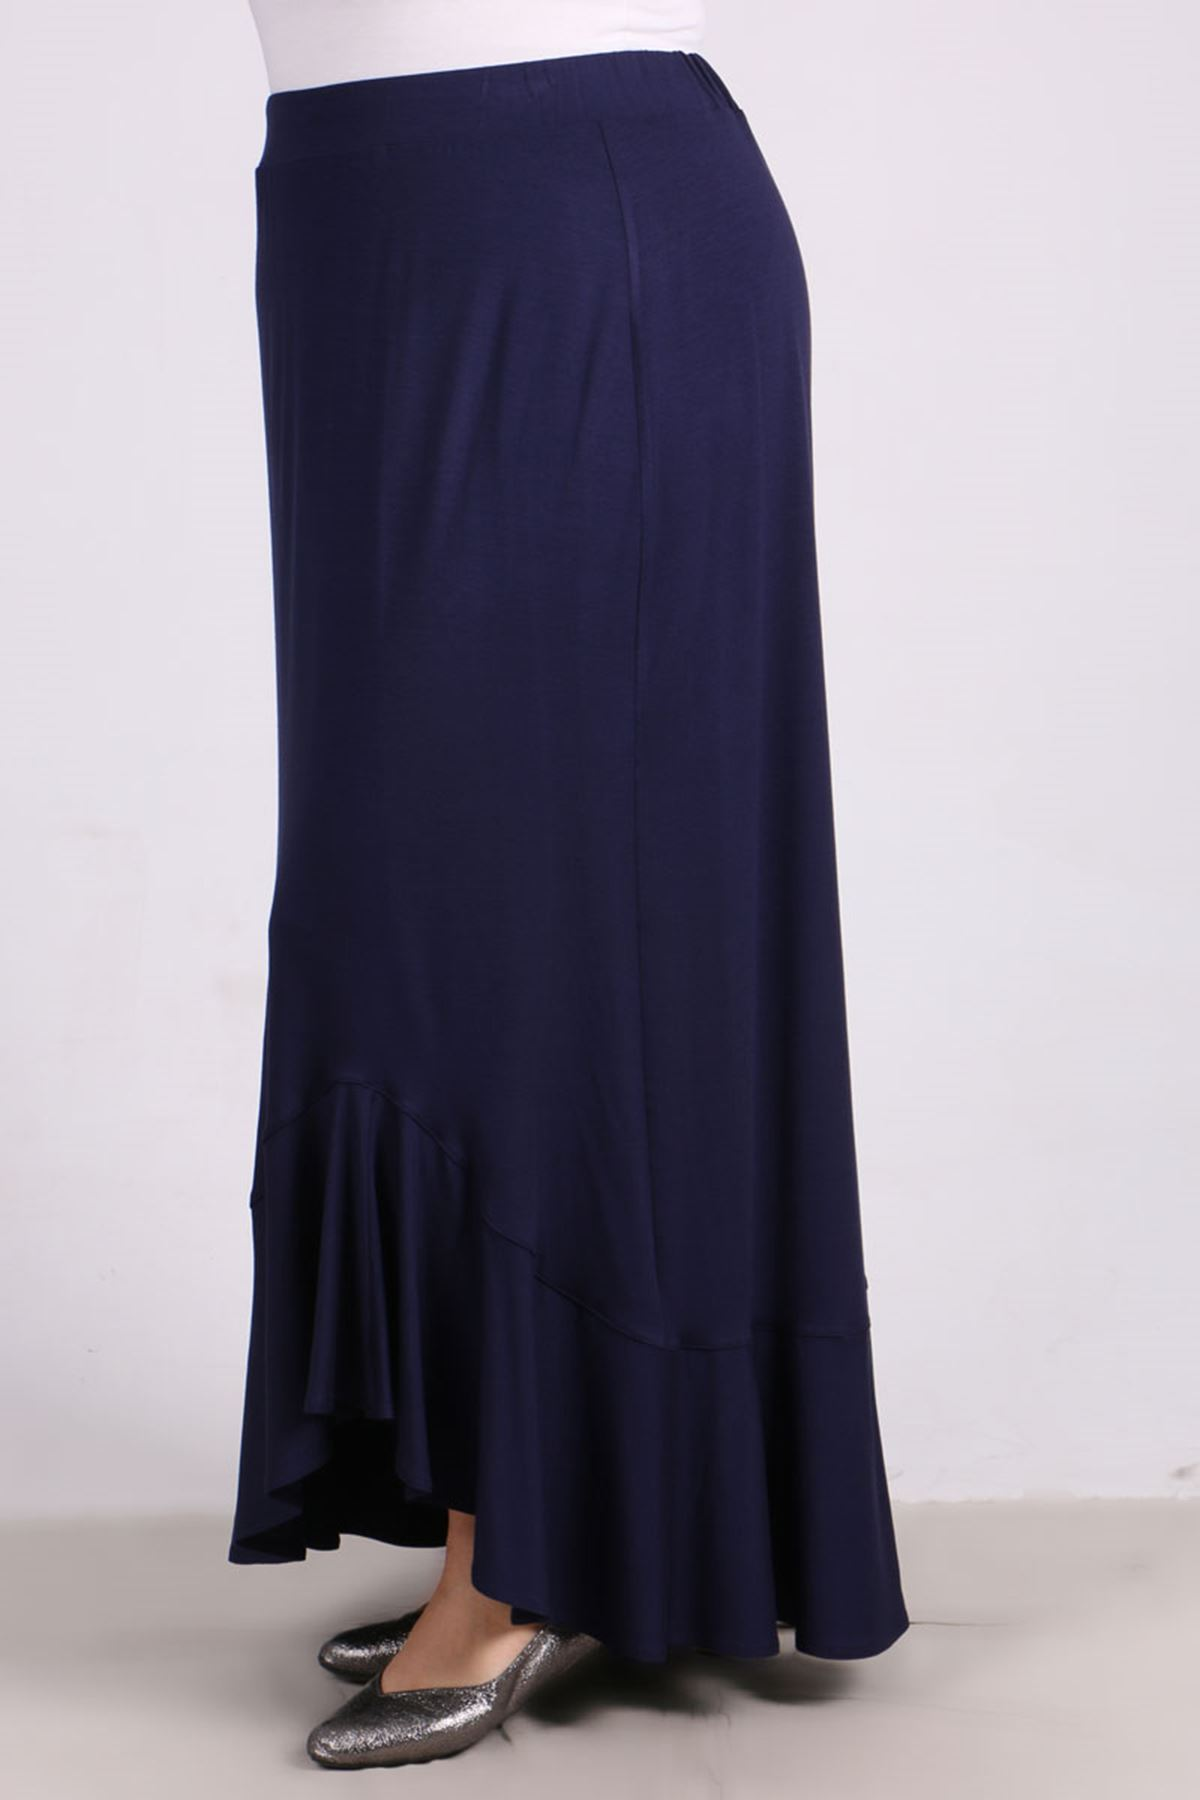 5045 Plus Size Flounce Skirt - Navy Blue